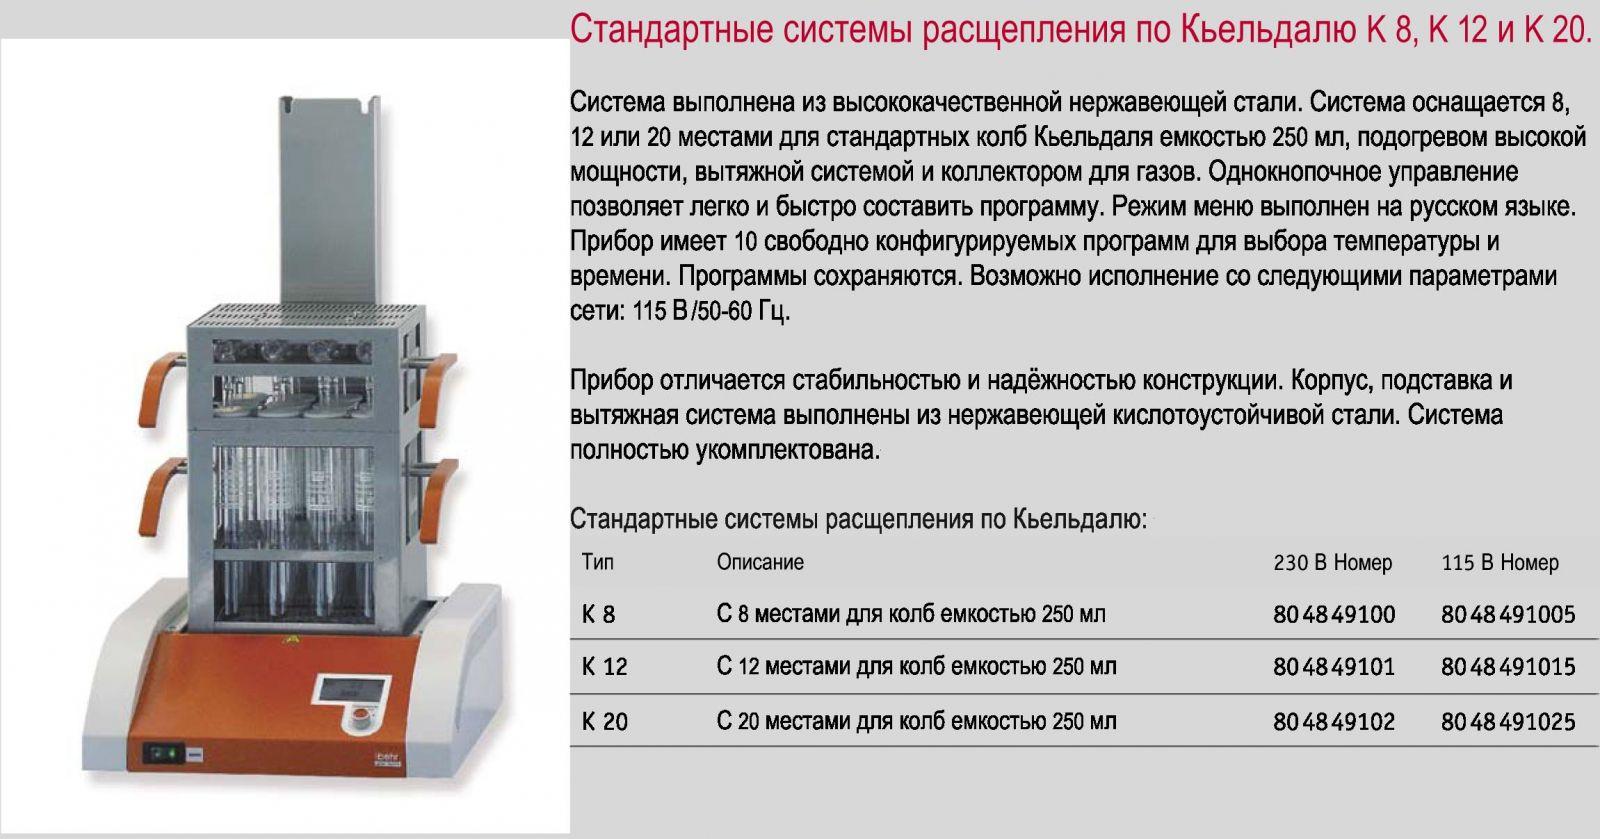 дистилляторы по низкой цене